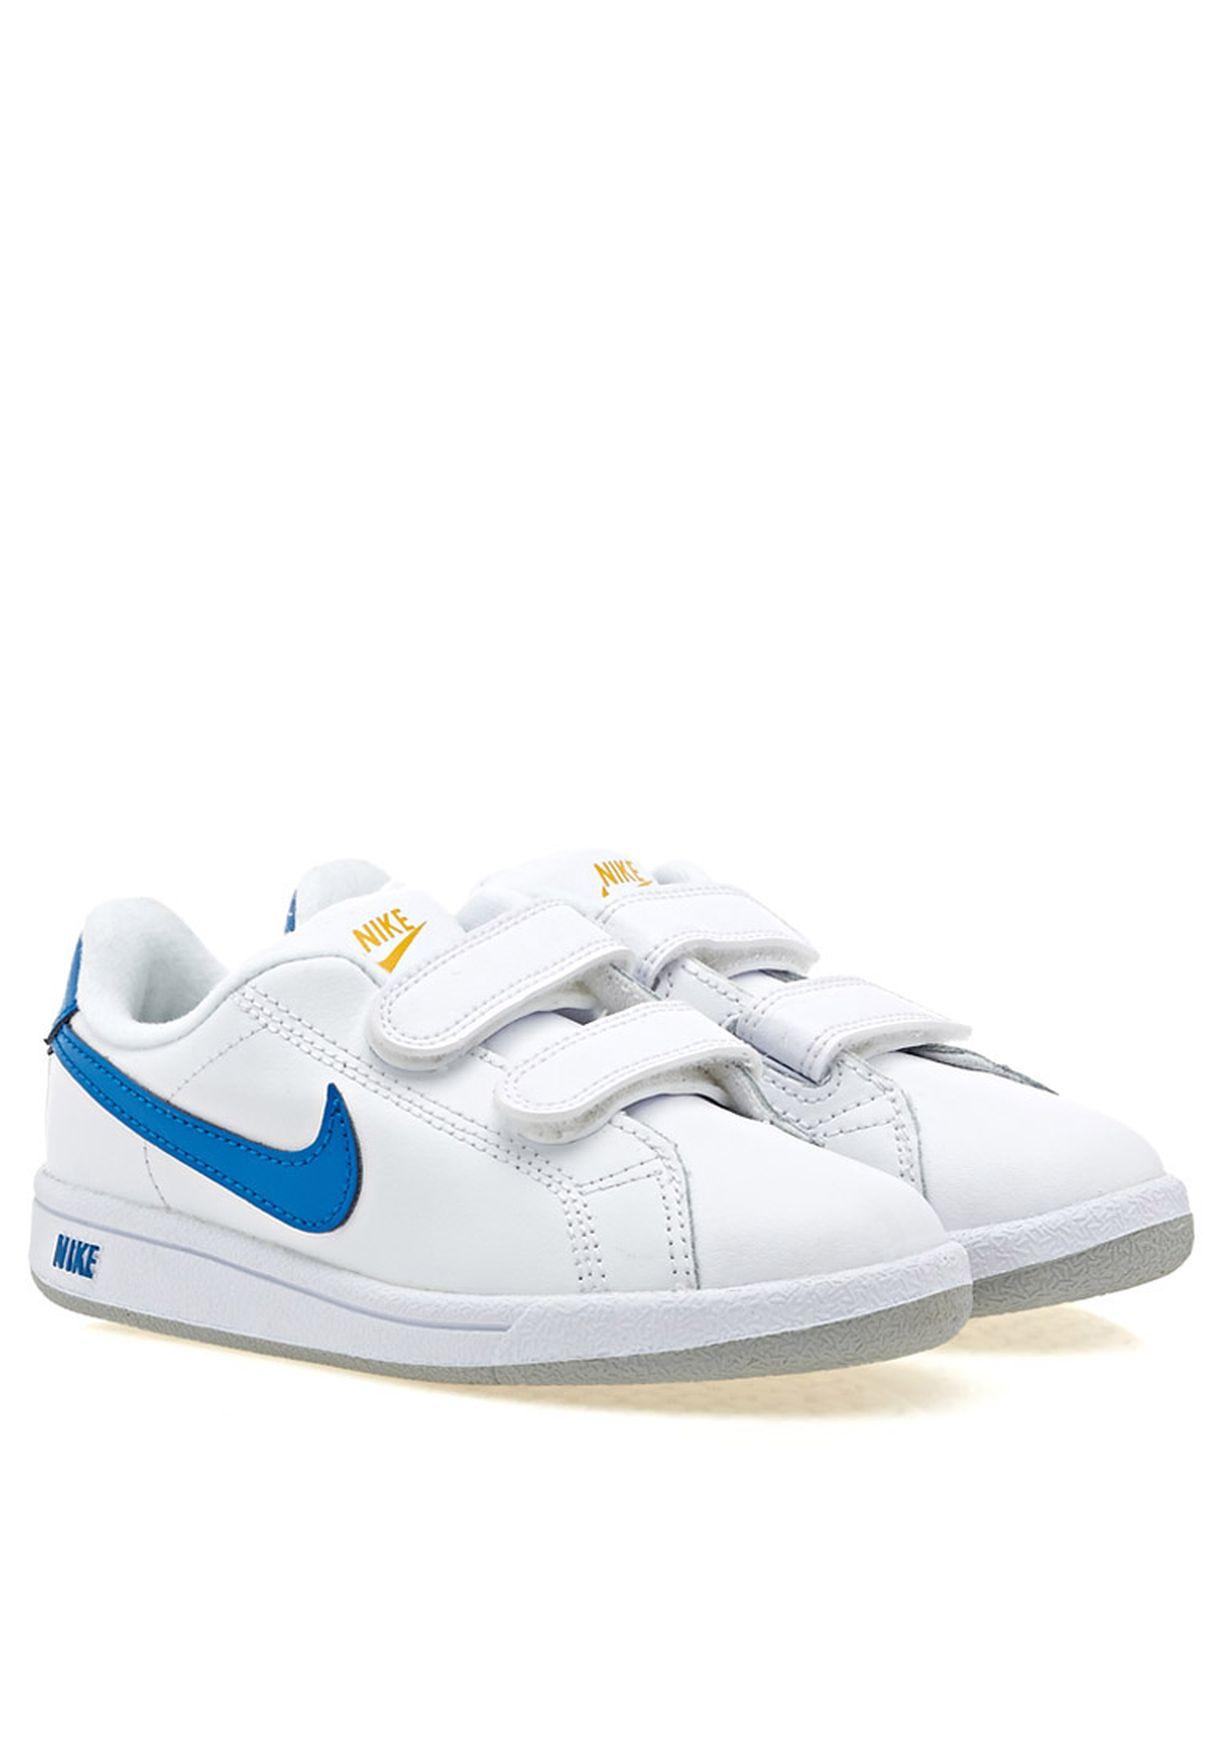 Main Draw Sneakers